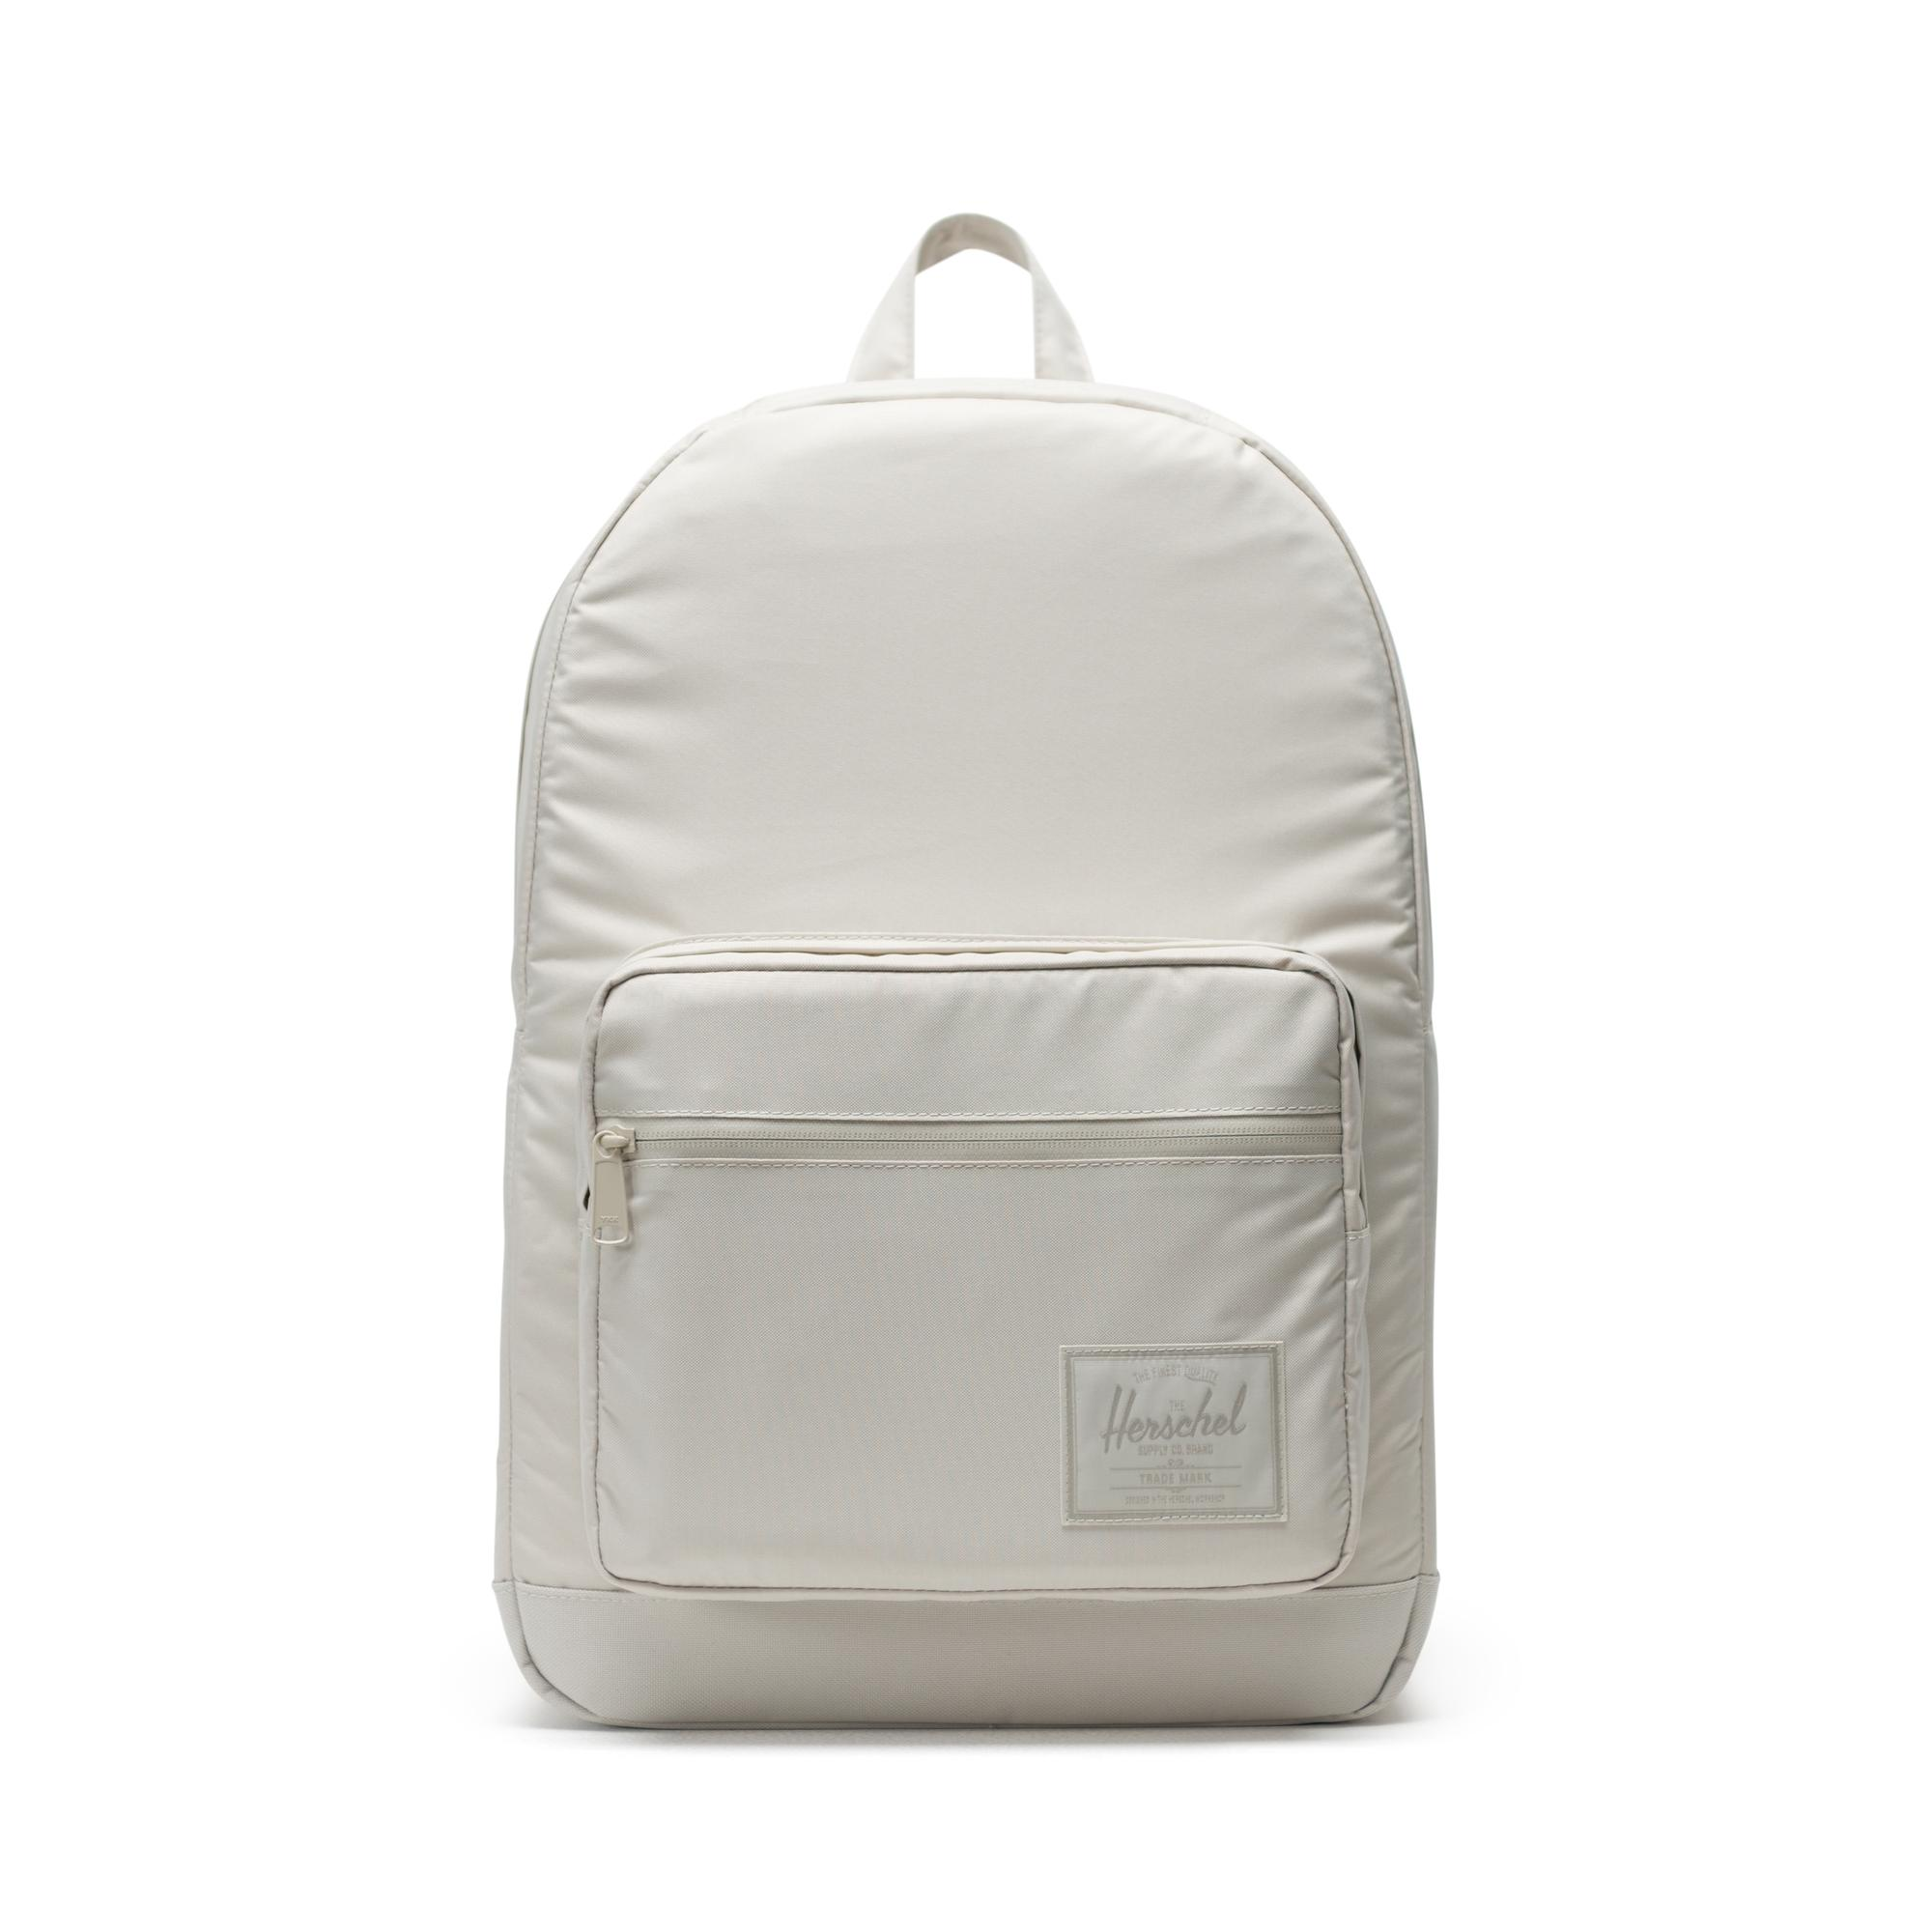 0be6a7c3335 Pop Quiz Backpack Light